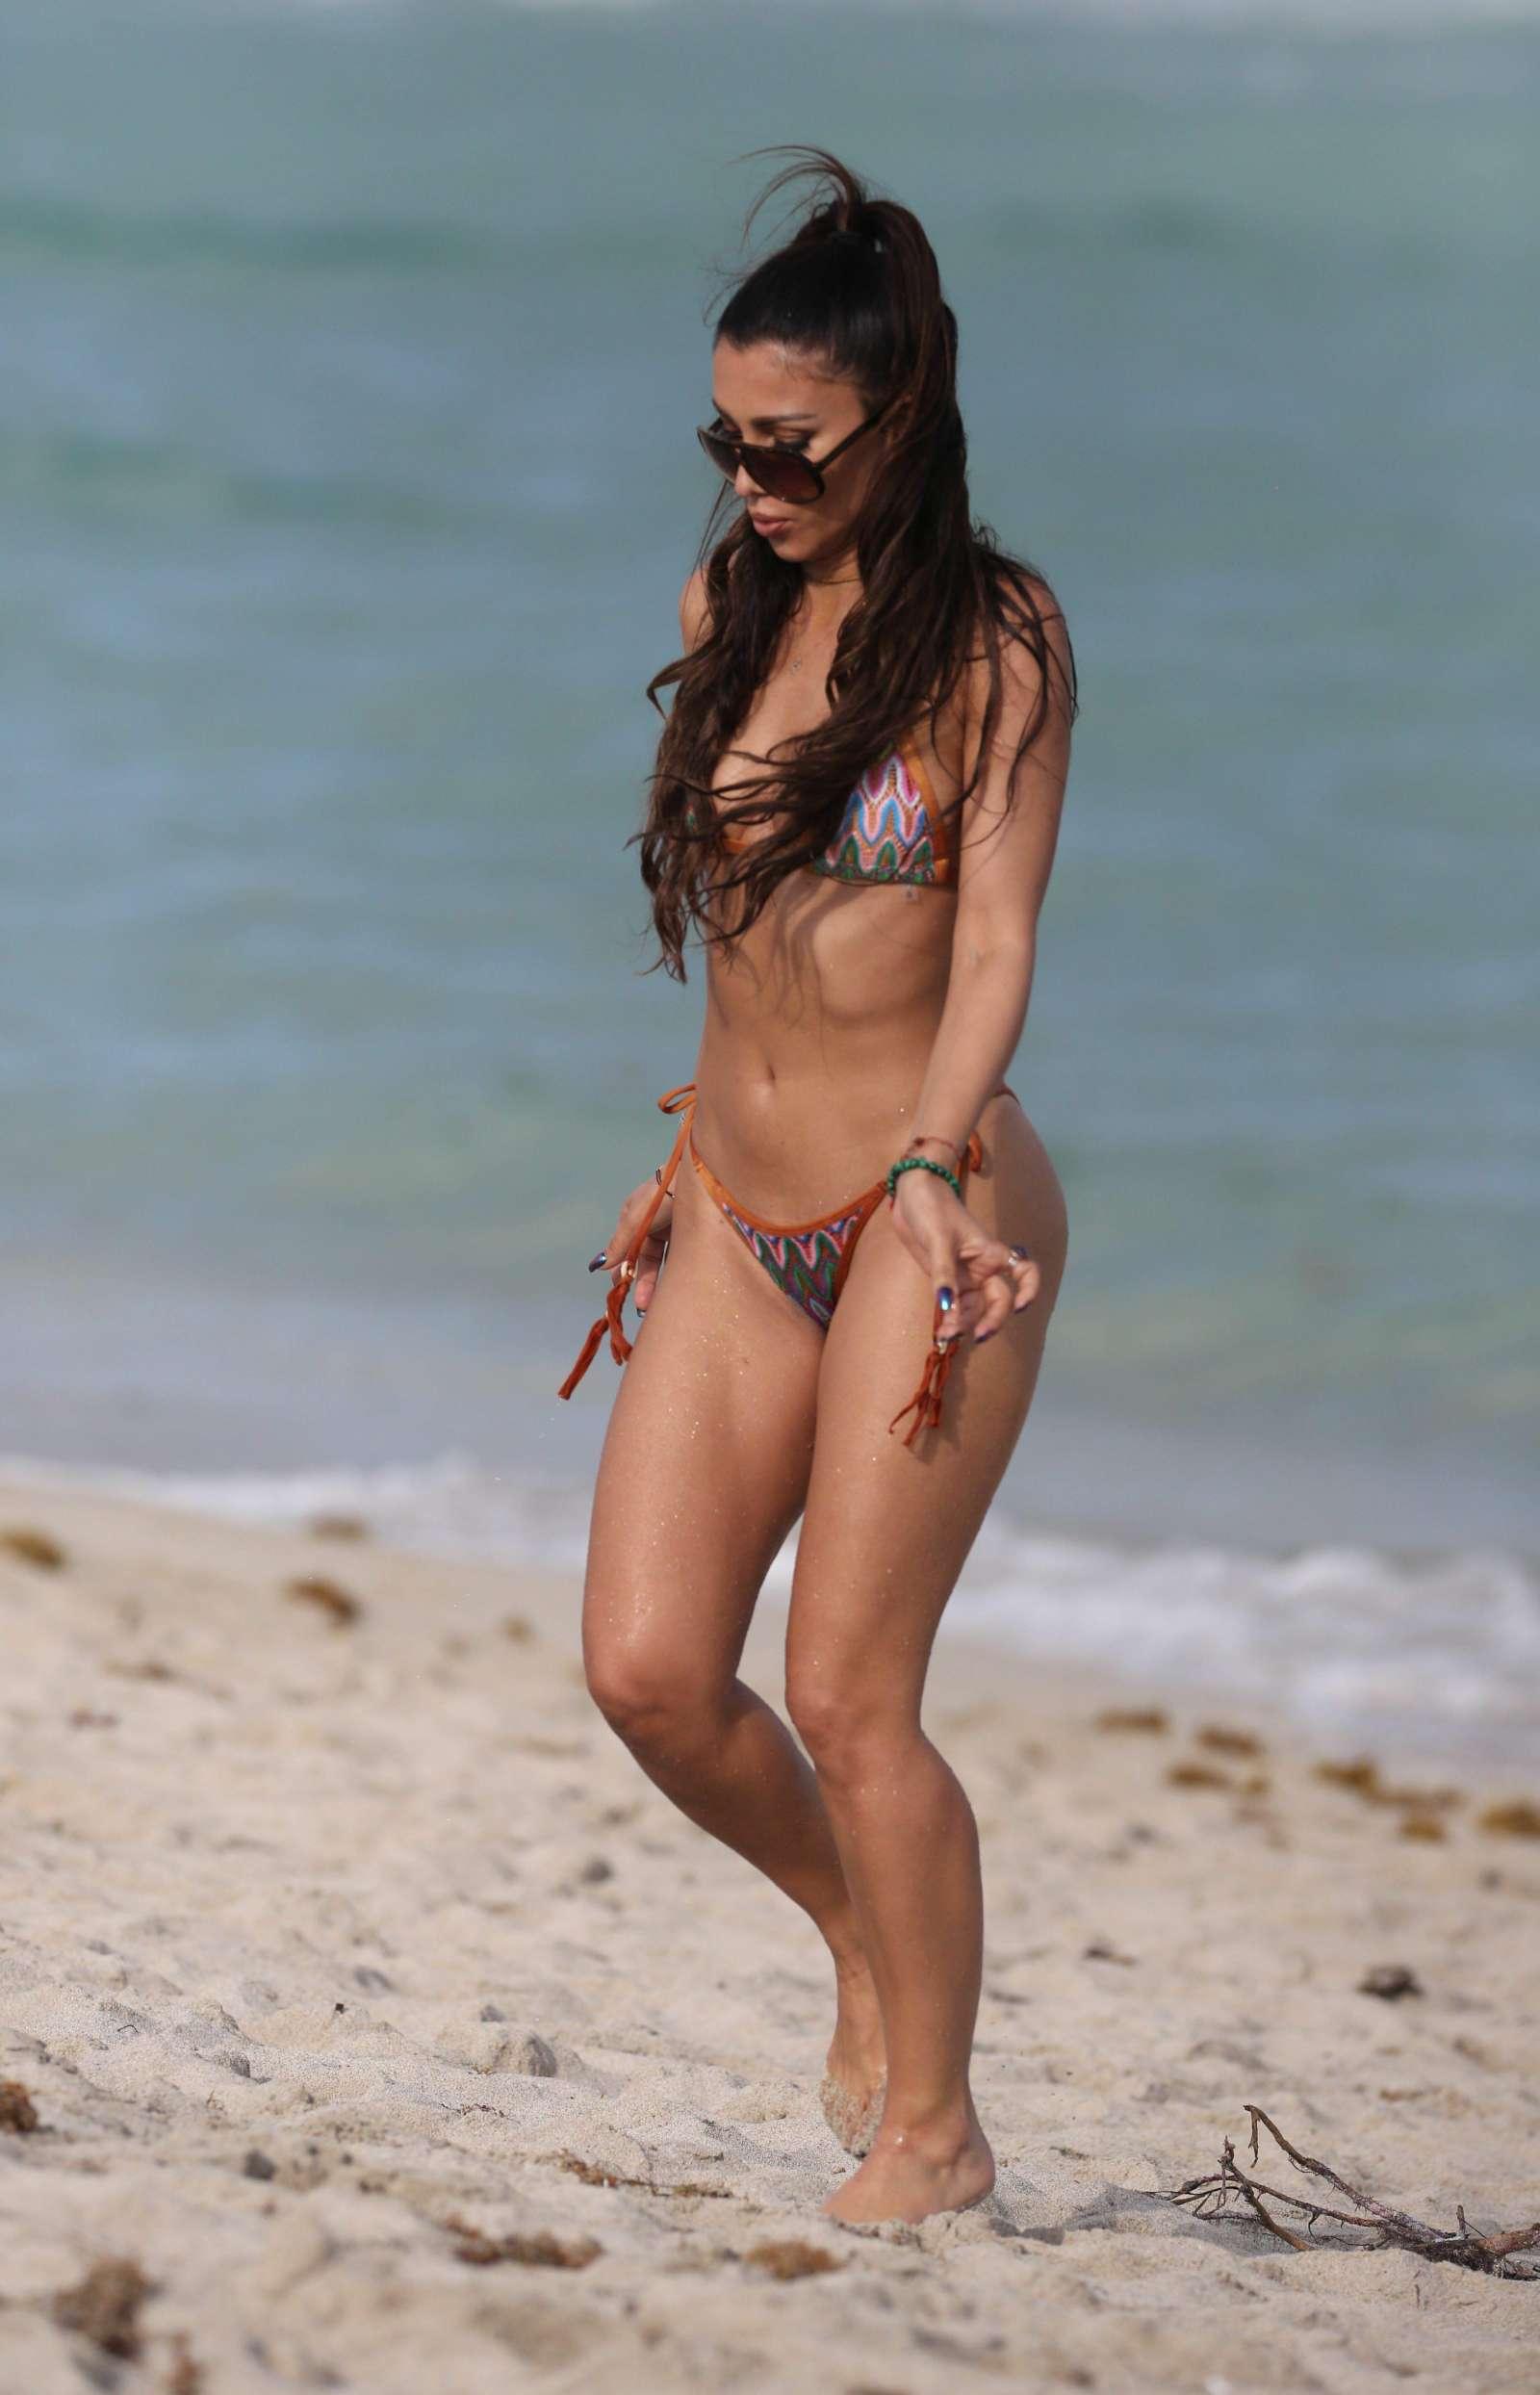 Metisha Schaefer Bikini Photoshoot on Miami Beach Pic 30 of 35